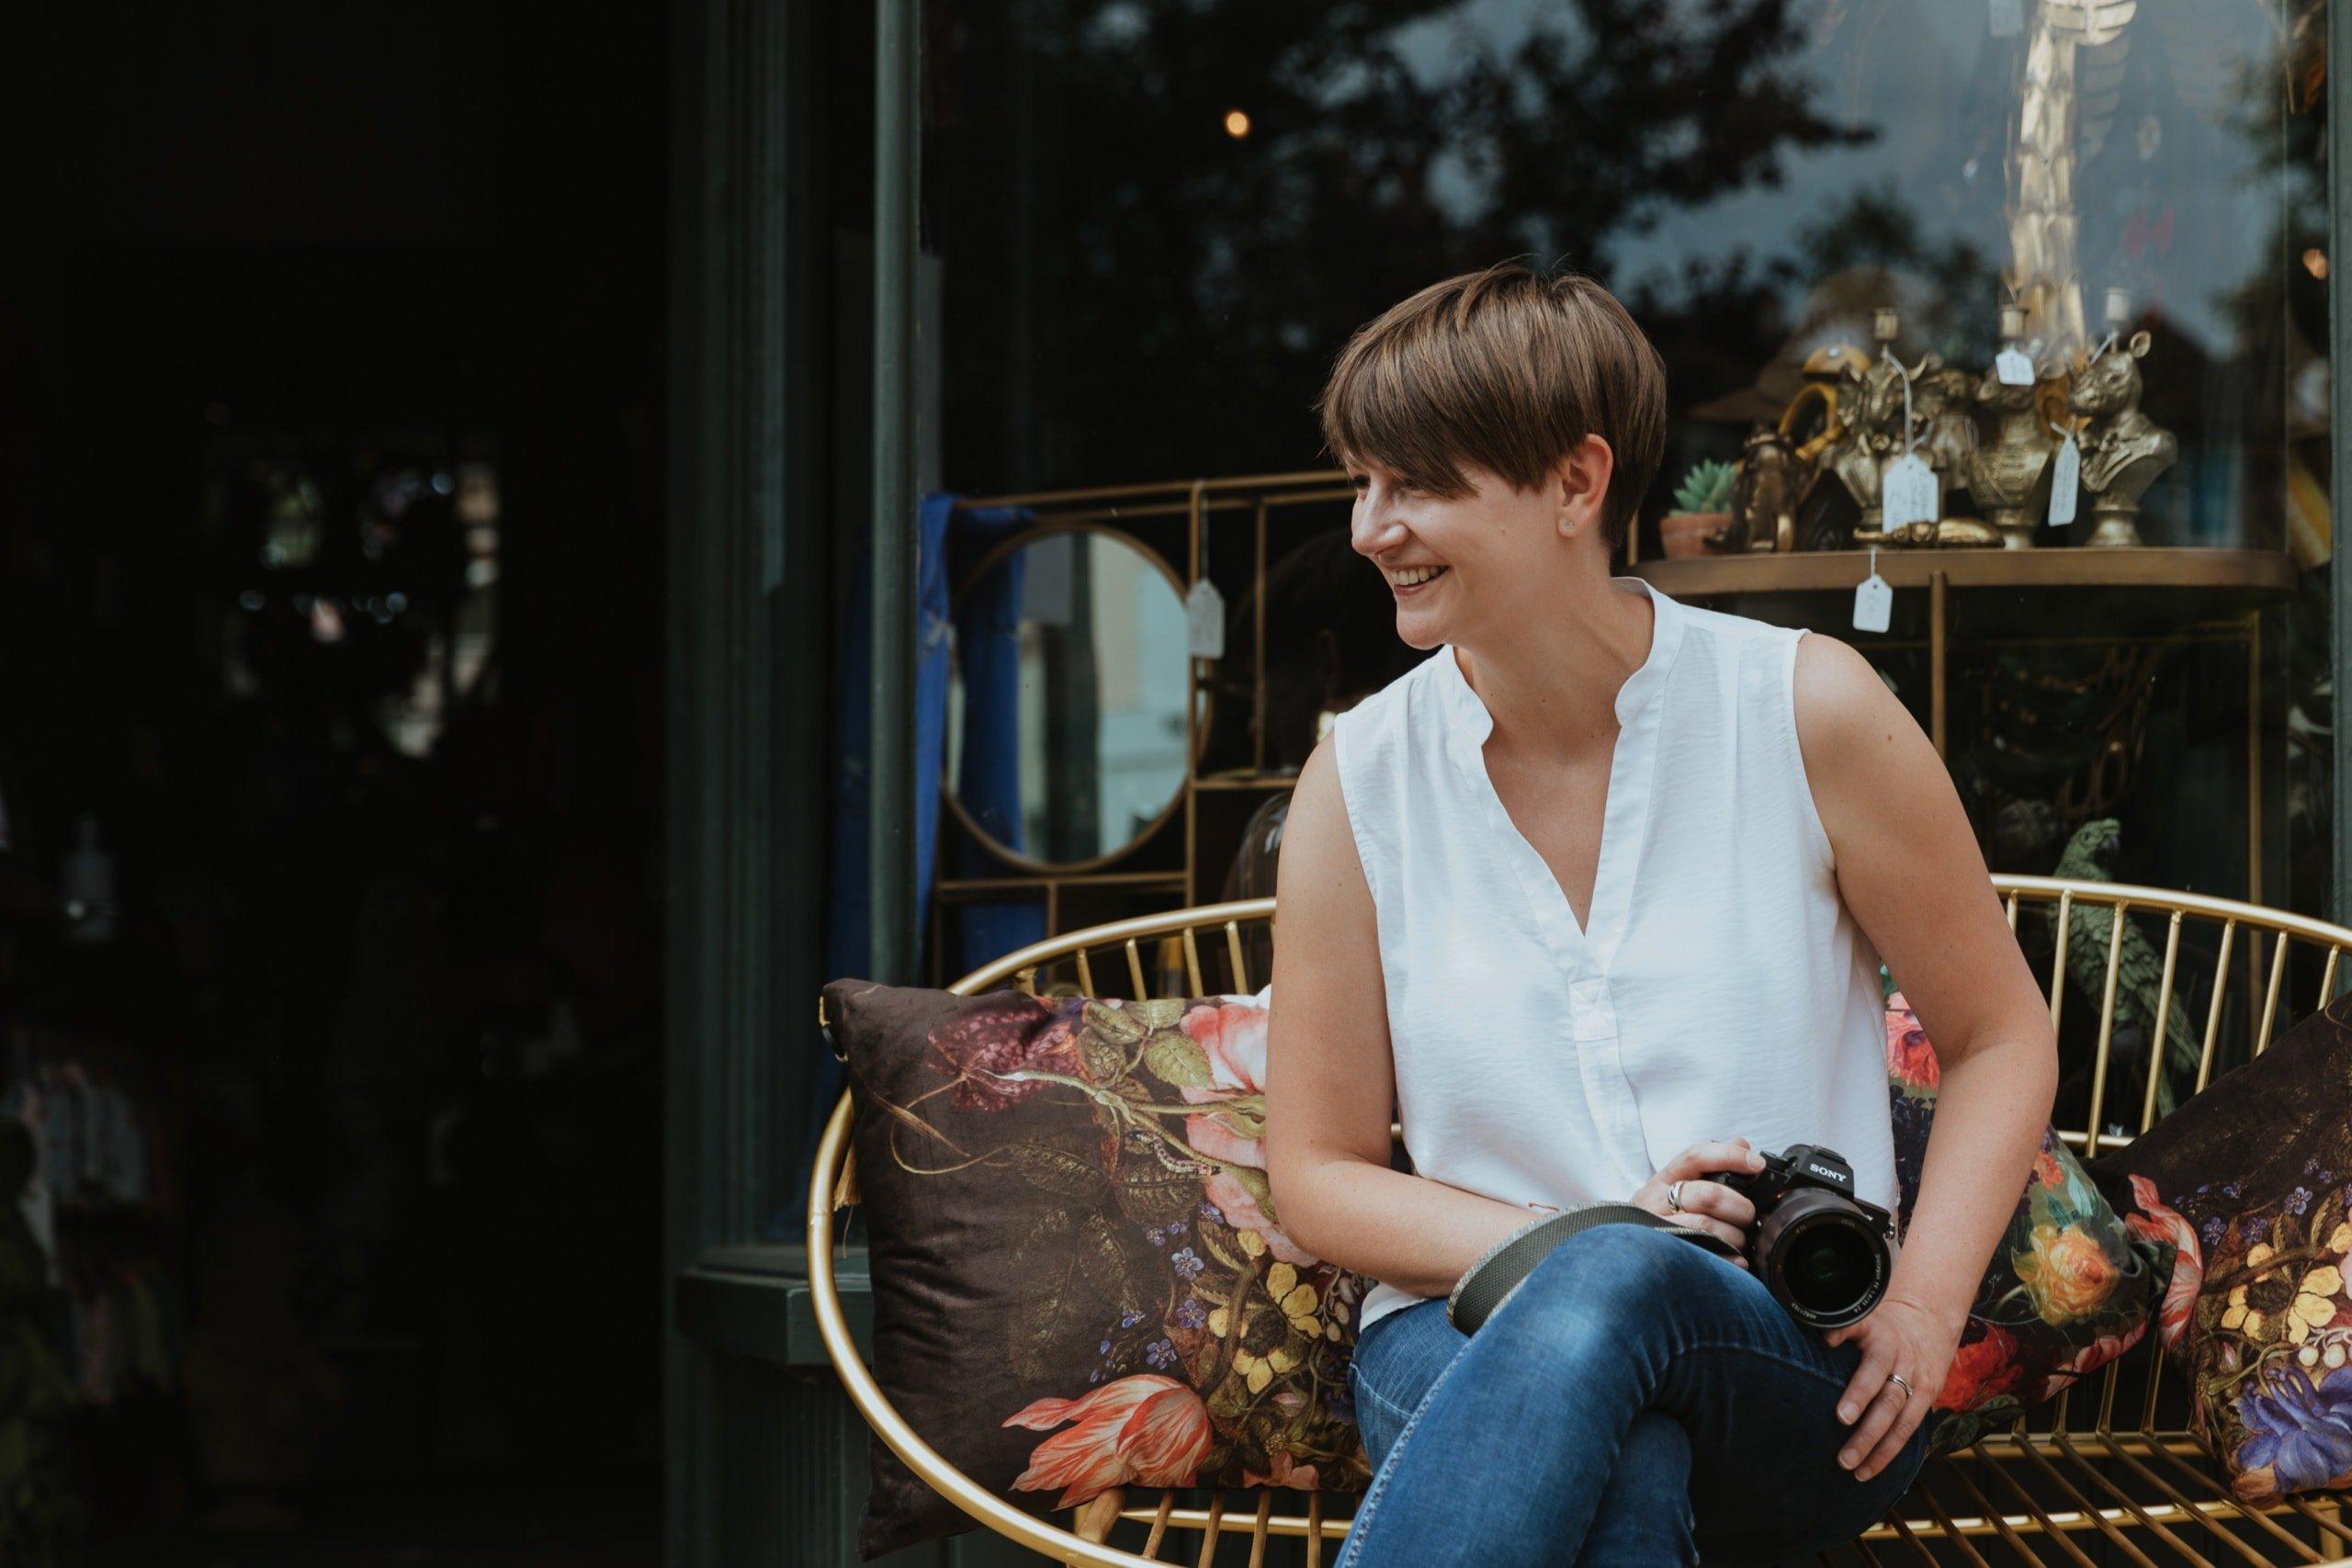 Nicola Dawson, Kent wedding photographer seated and smiling